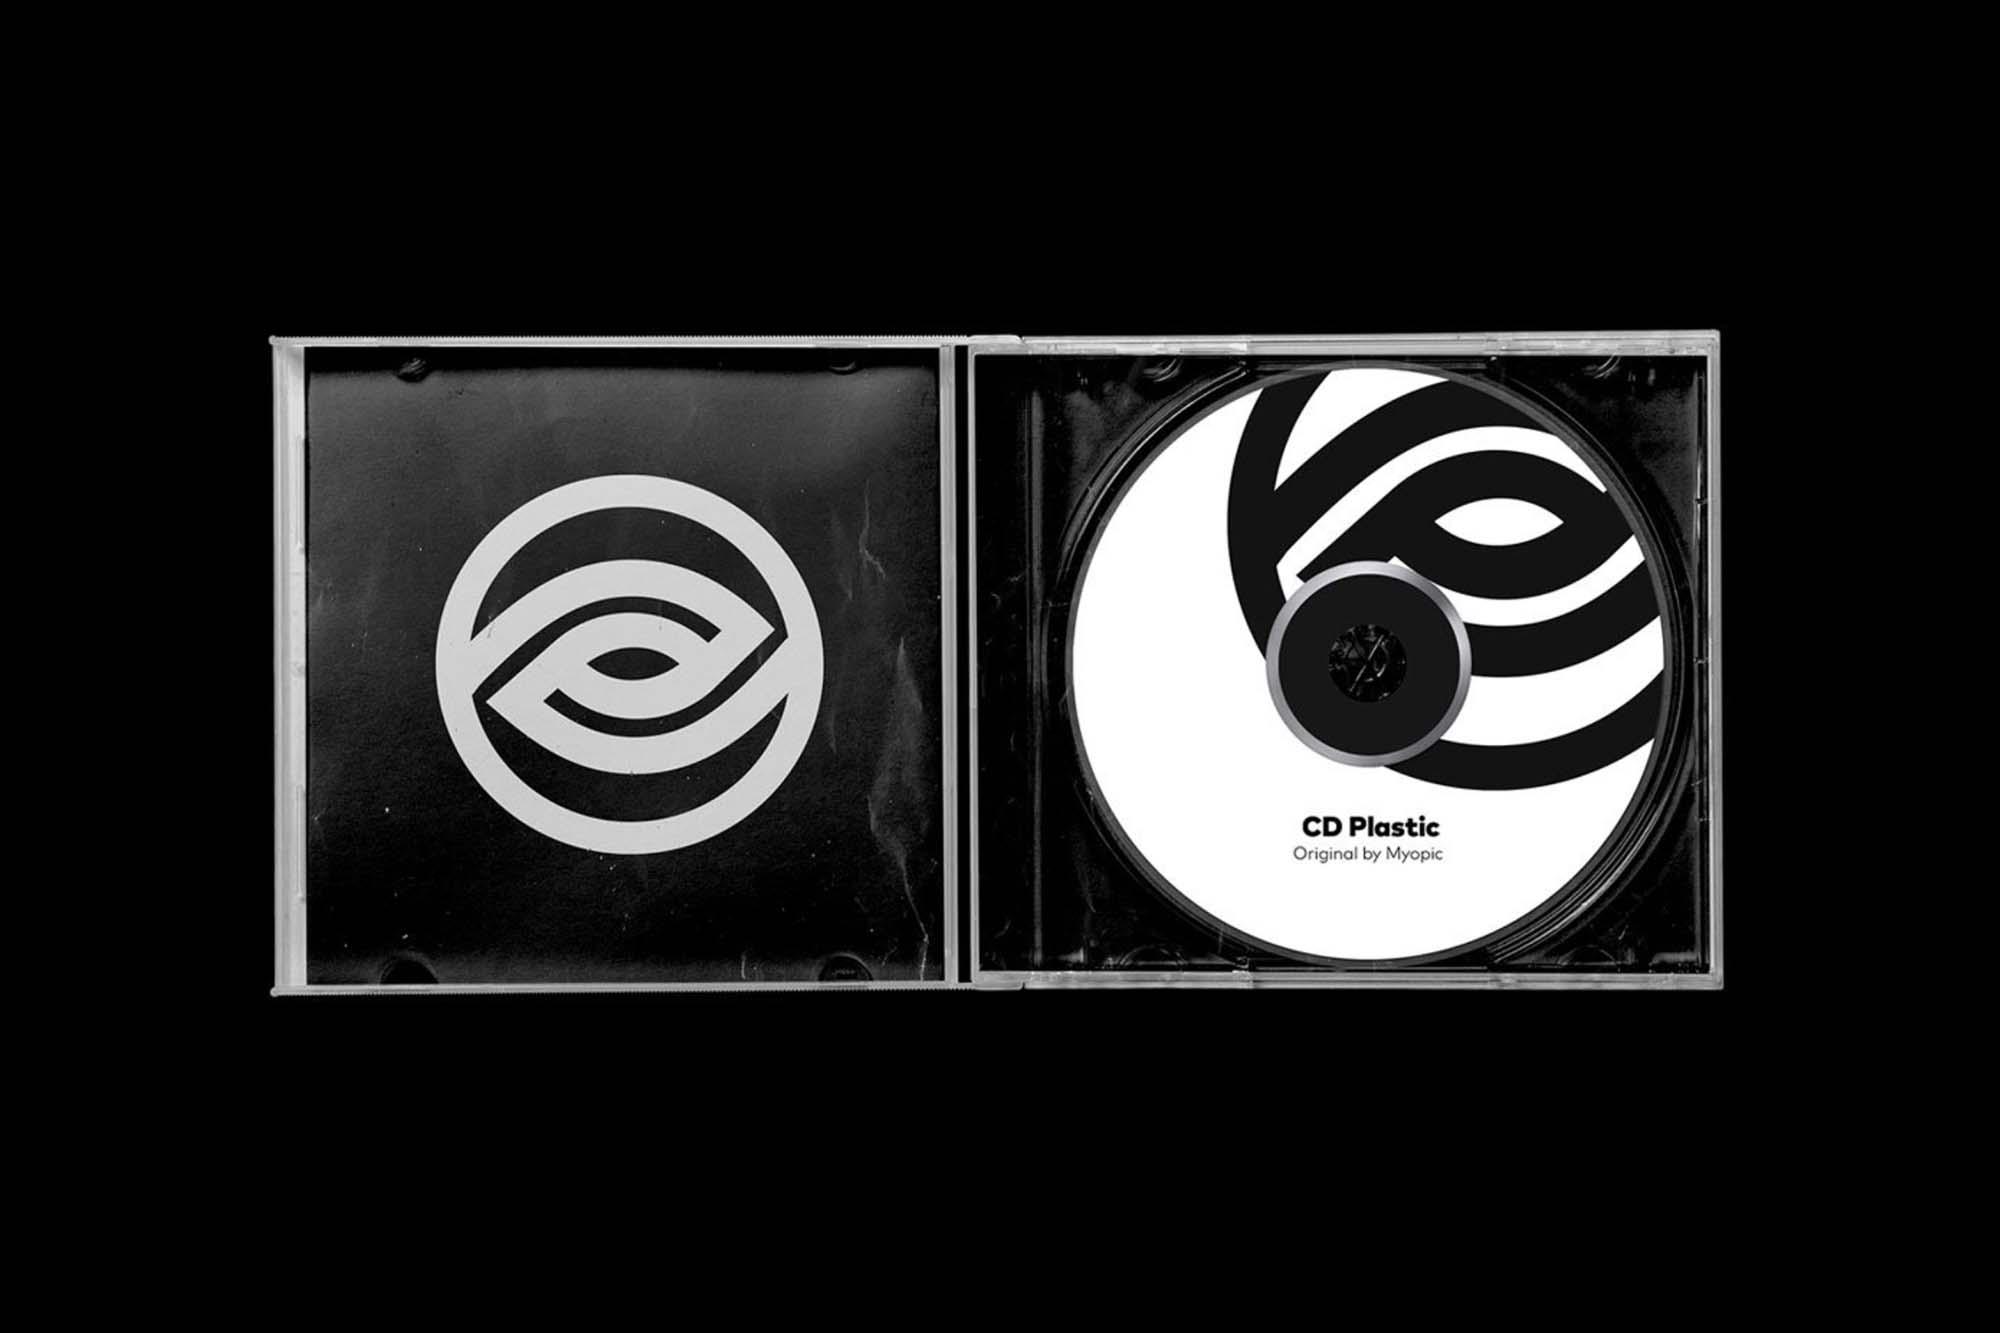 CD Retro Design Mockup